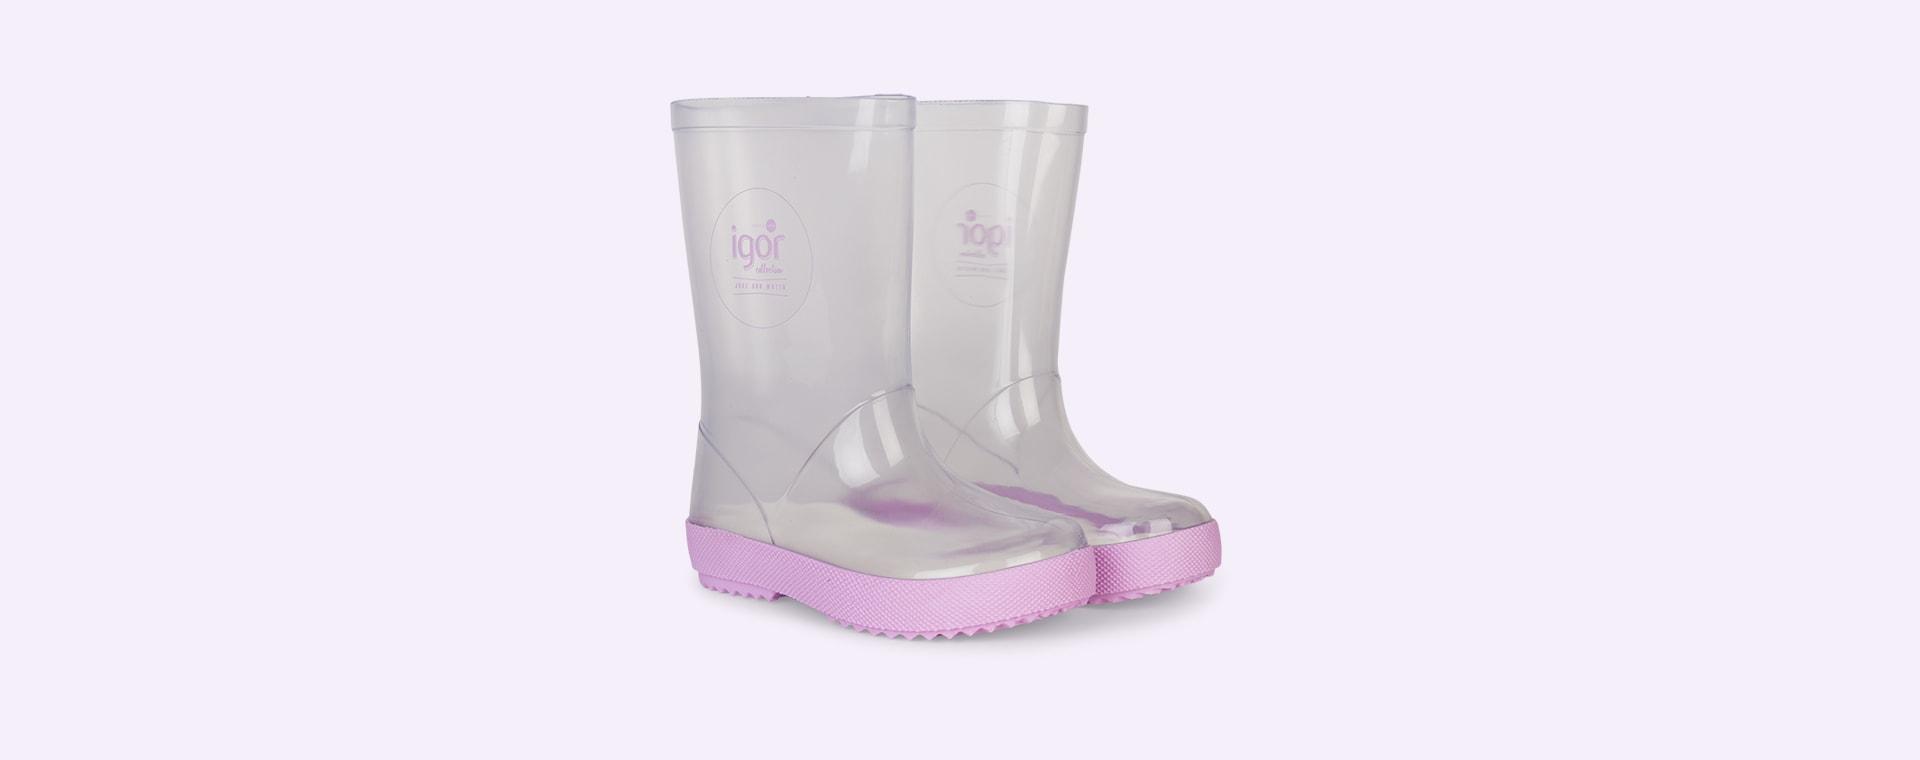 Mauve igor Splash Crystal Transparent Wellies & Socks